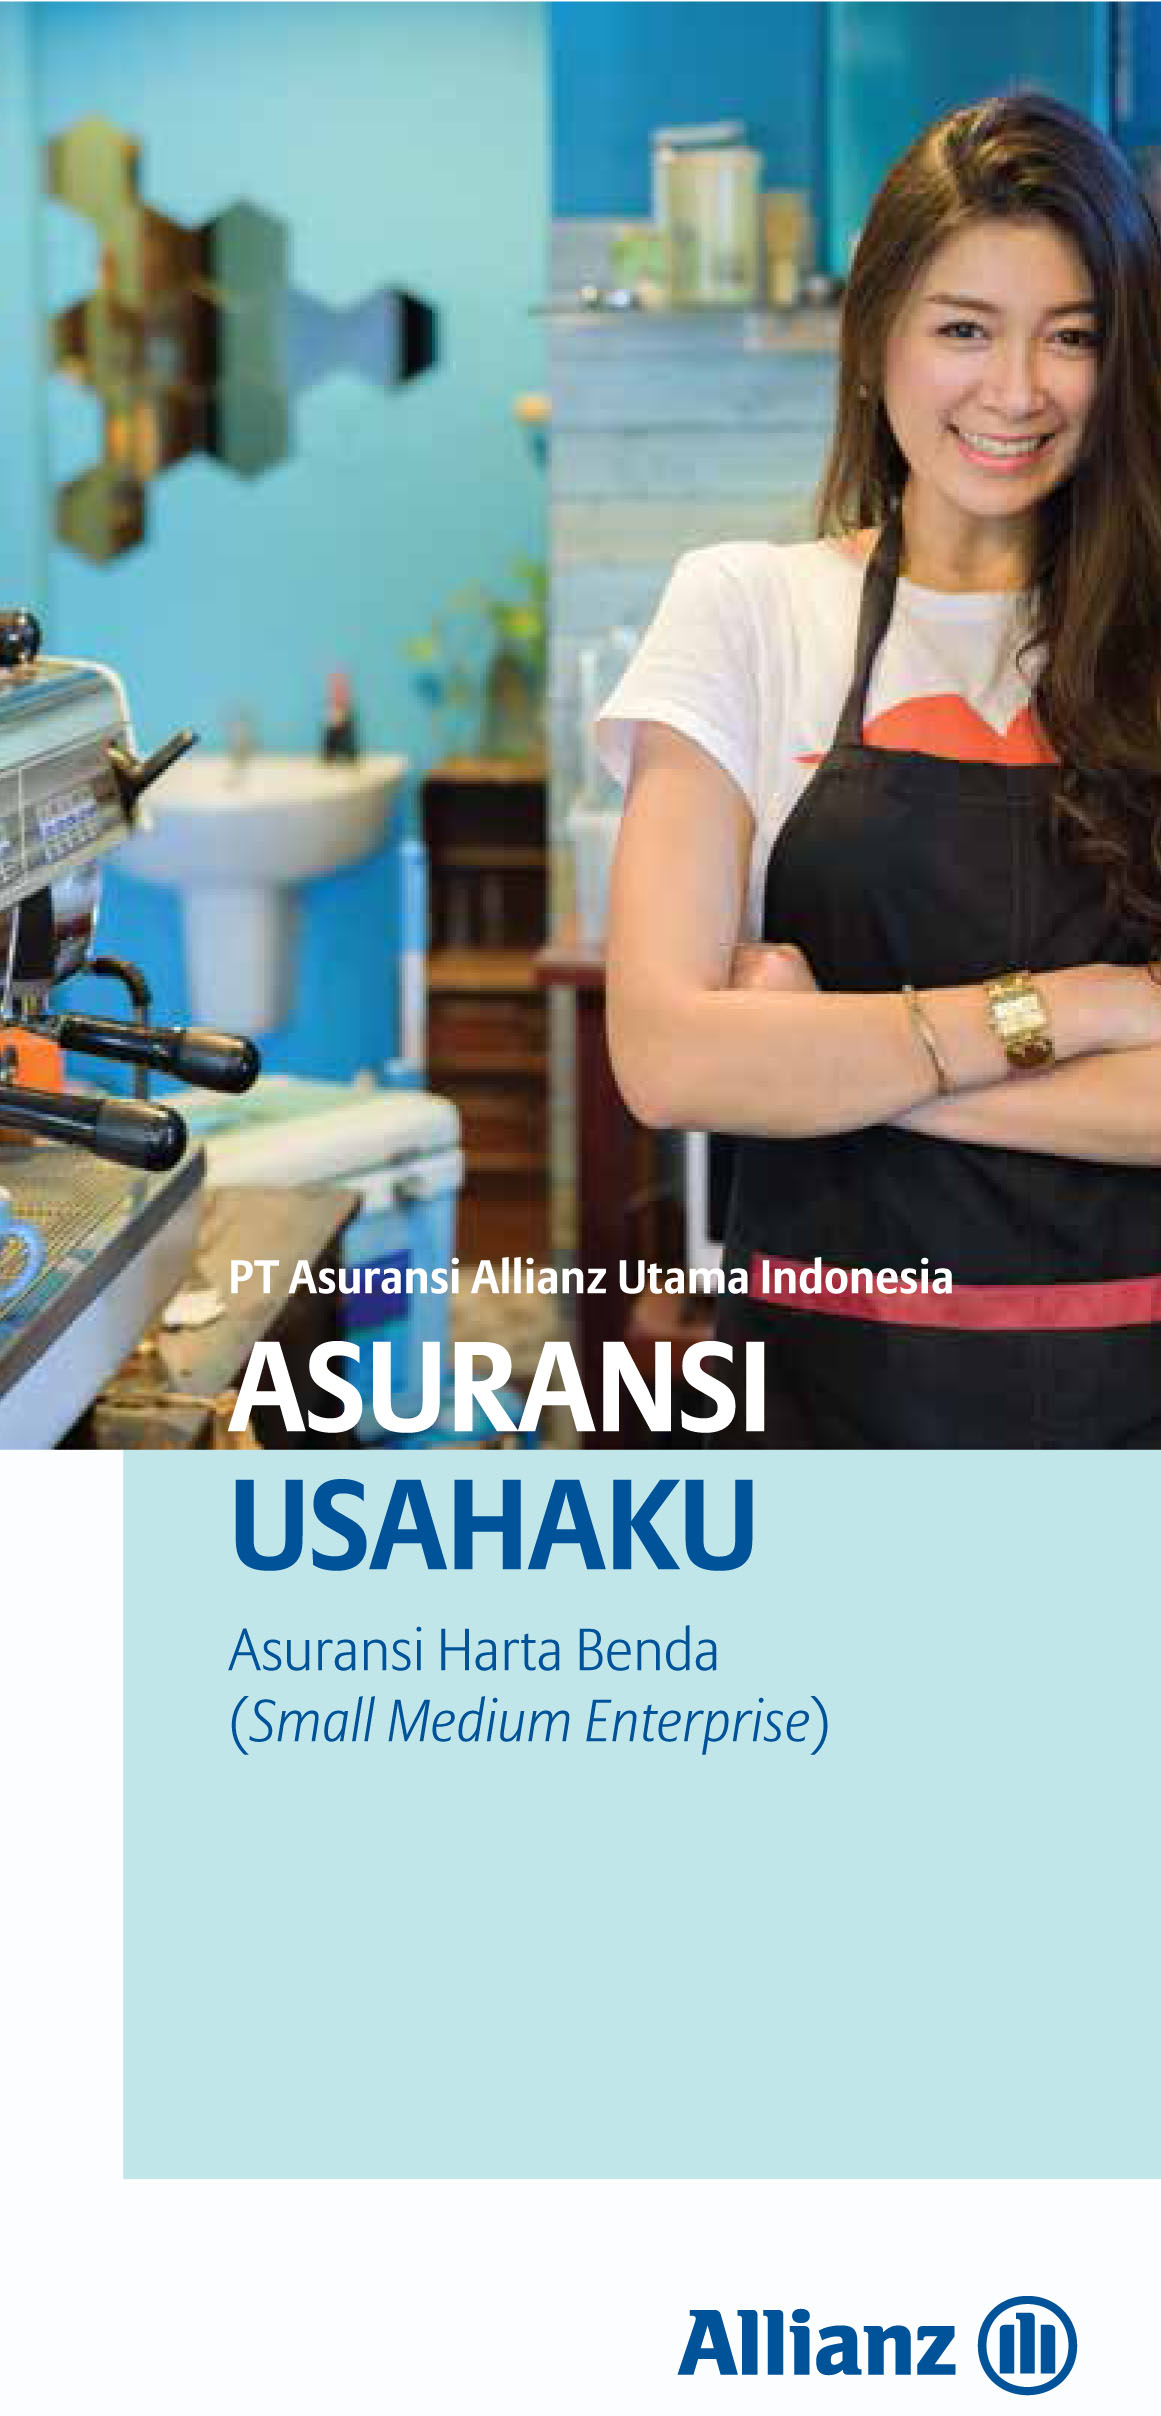 Brosur Asuransi UsahaKu (Small Medium Enterprise)_v1.7